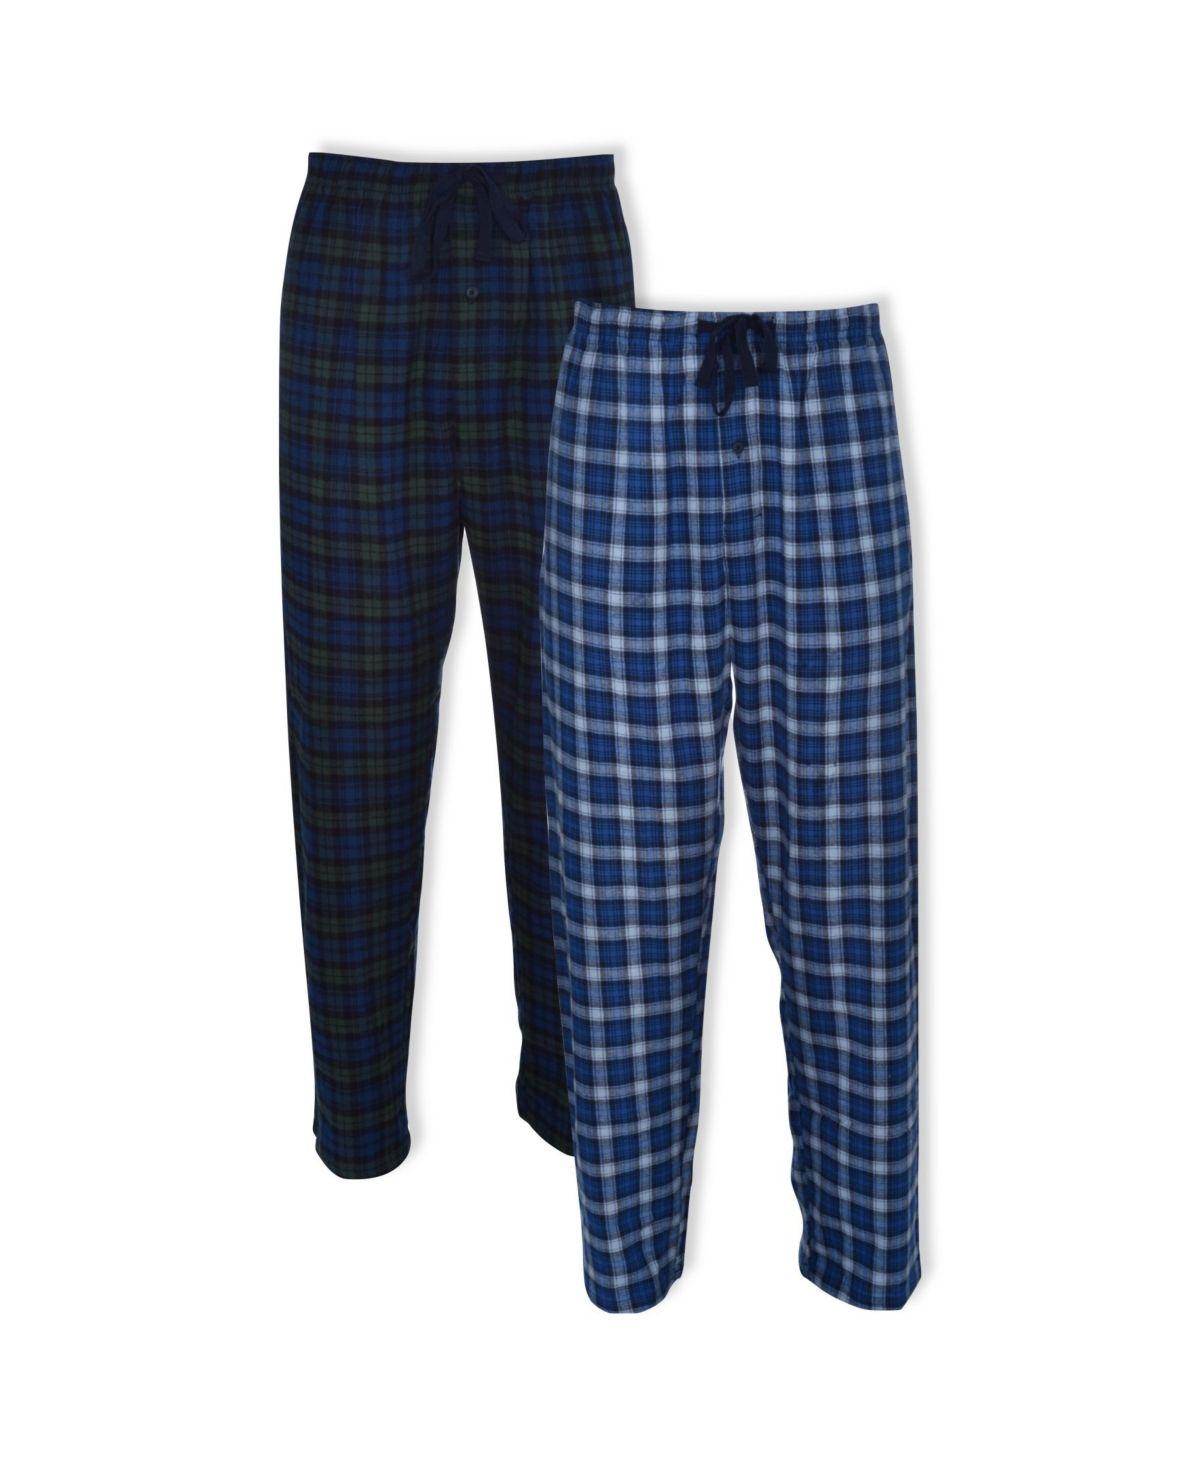 Hanes Mens Big and Tall Flannel Lounge Pajama Pants